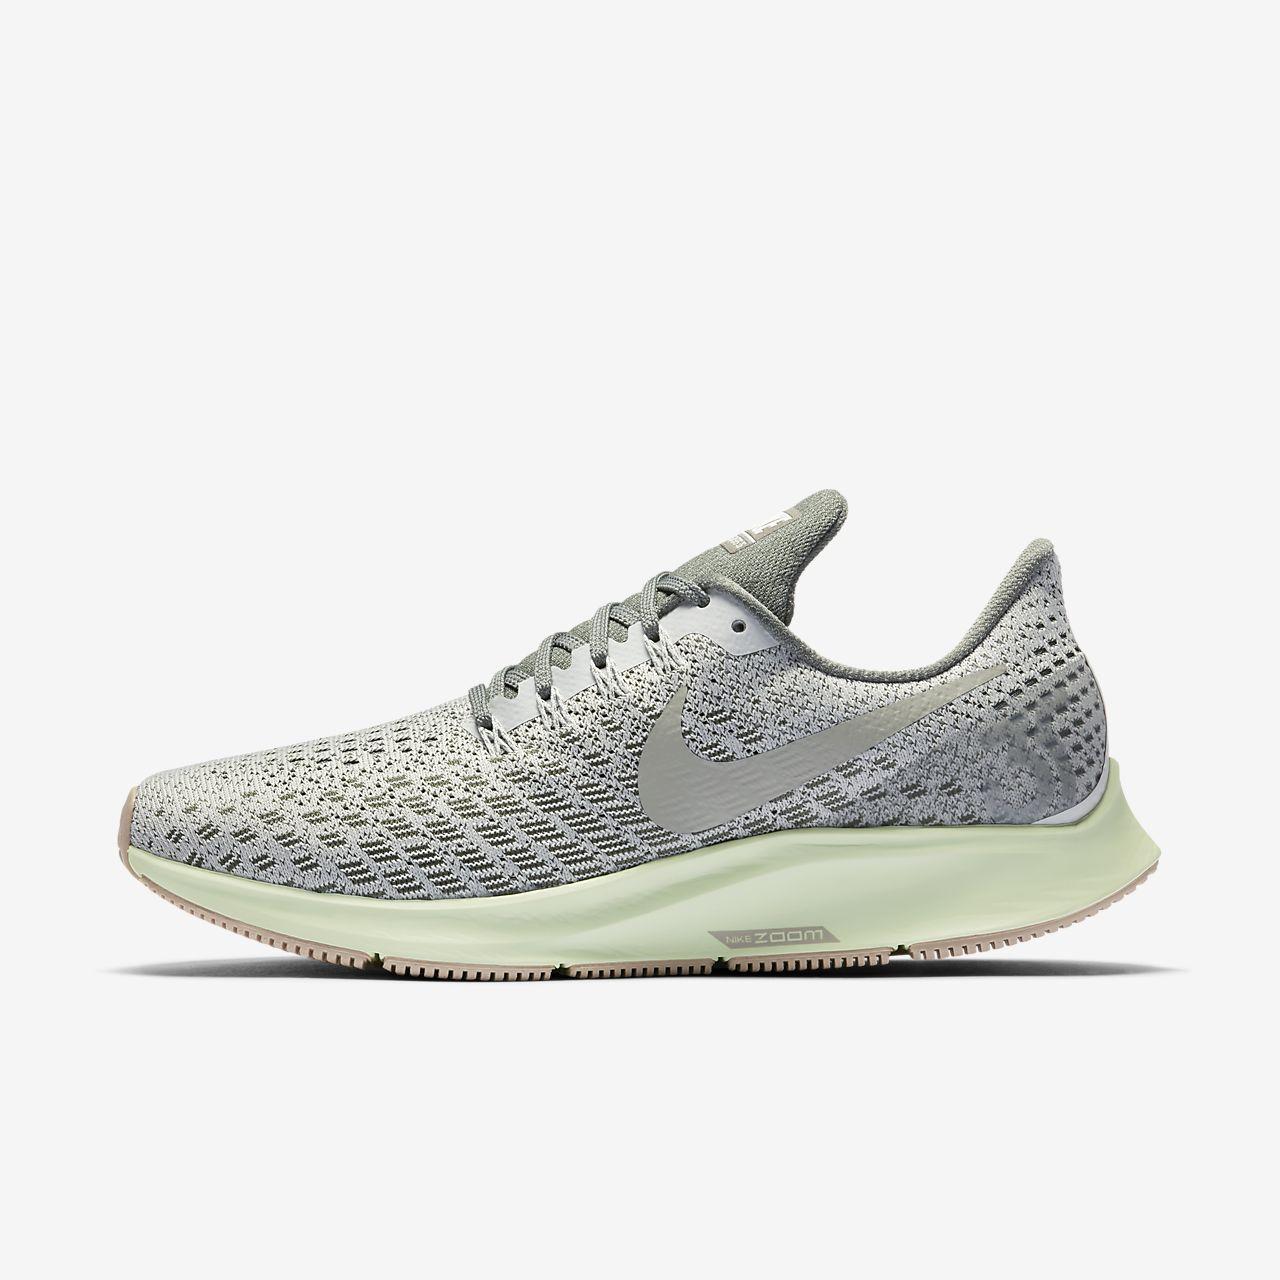 498b26f88e7 ... get nike air zoom pegasus 35 zapatillas de running mujer 50fa6 d011d